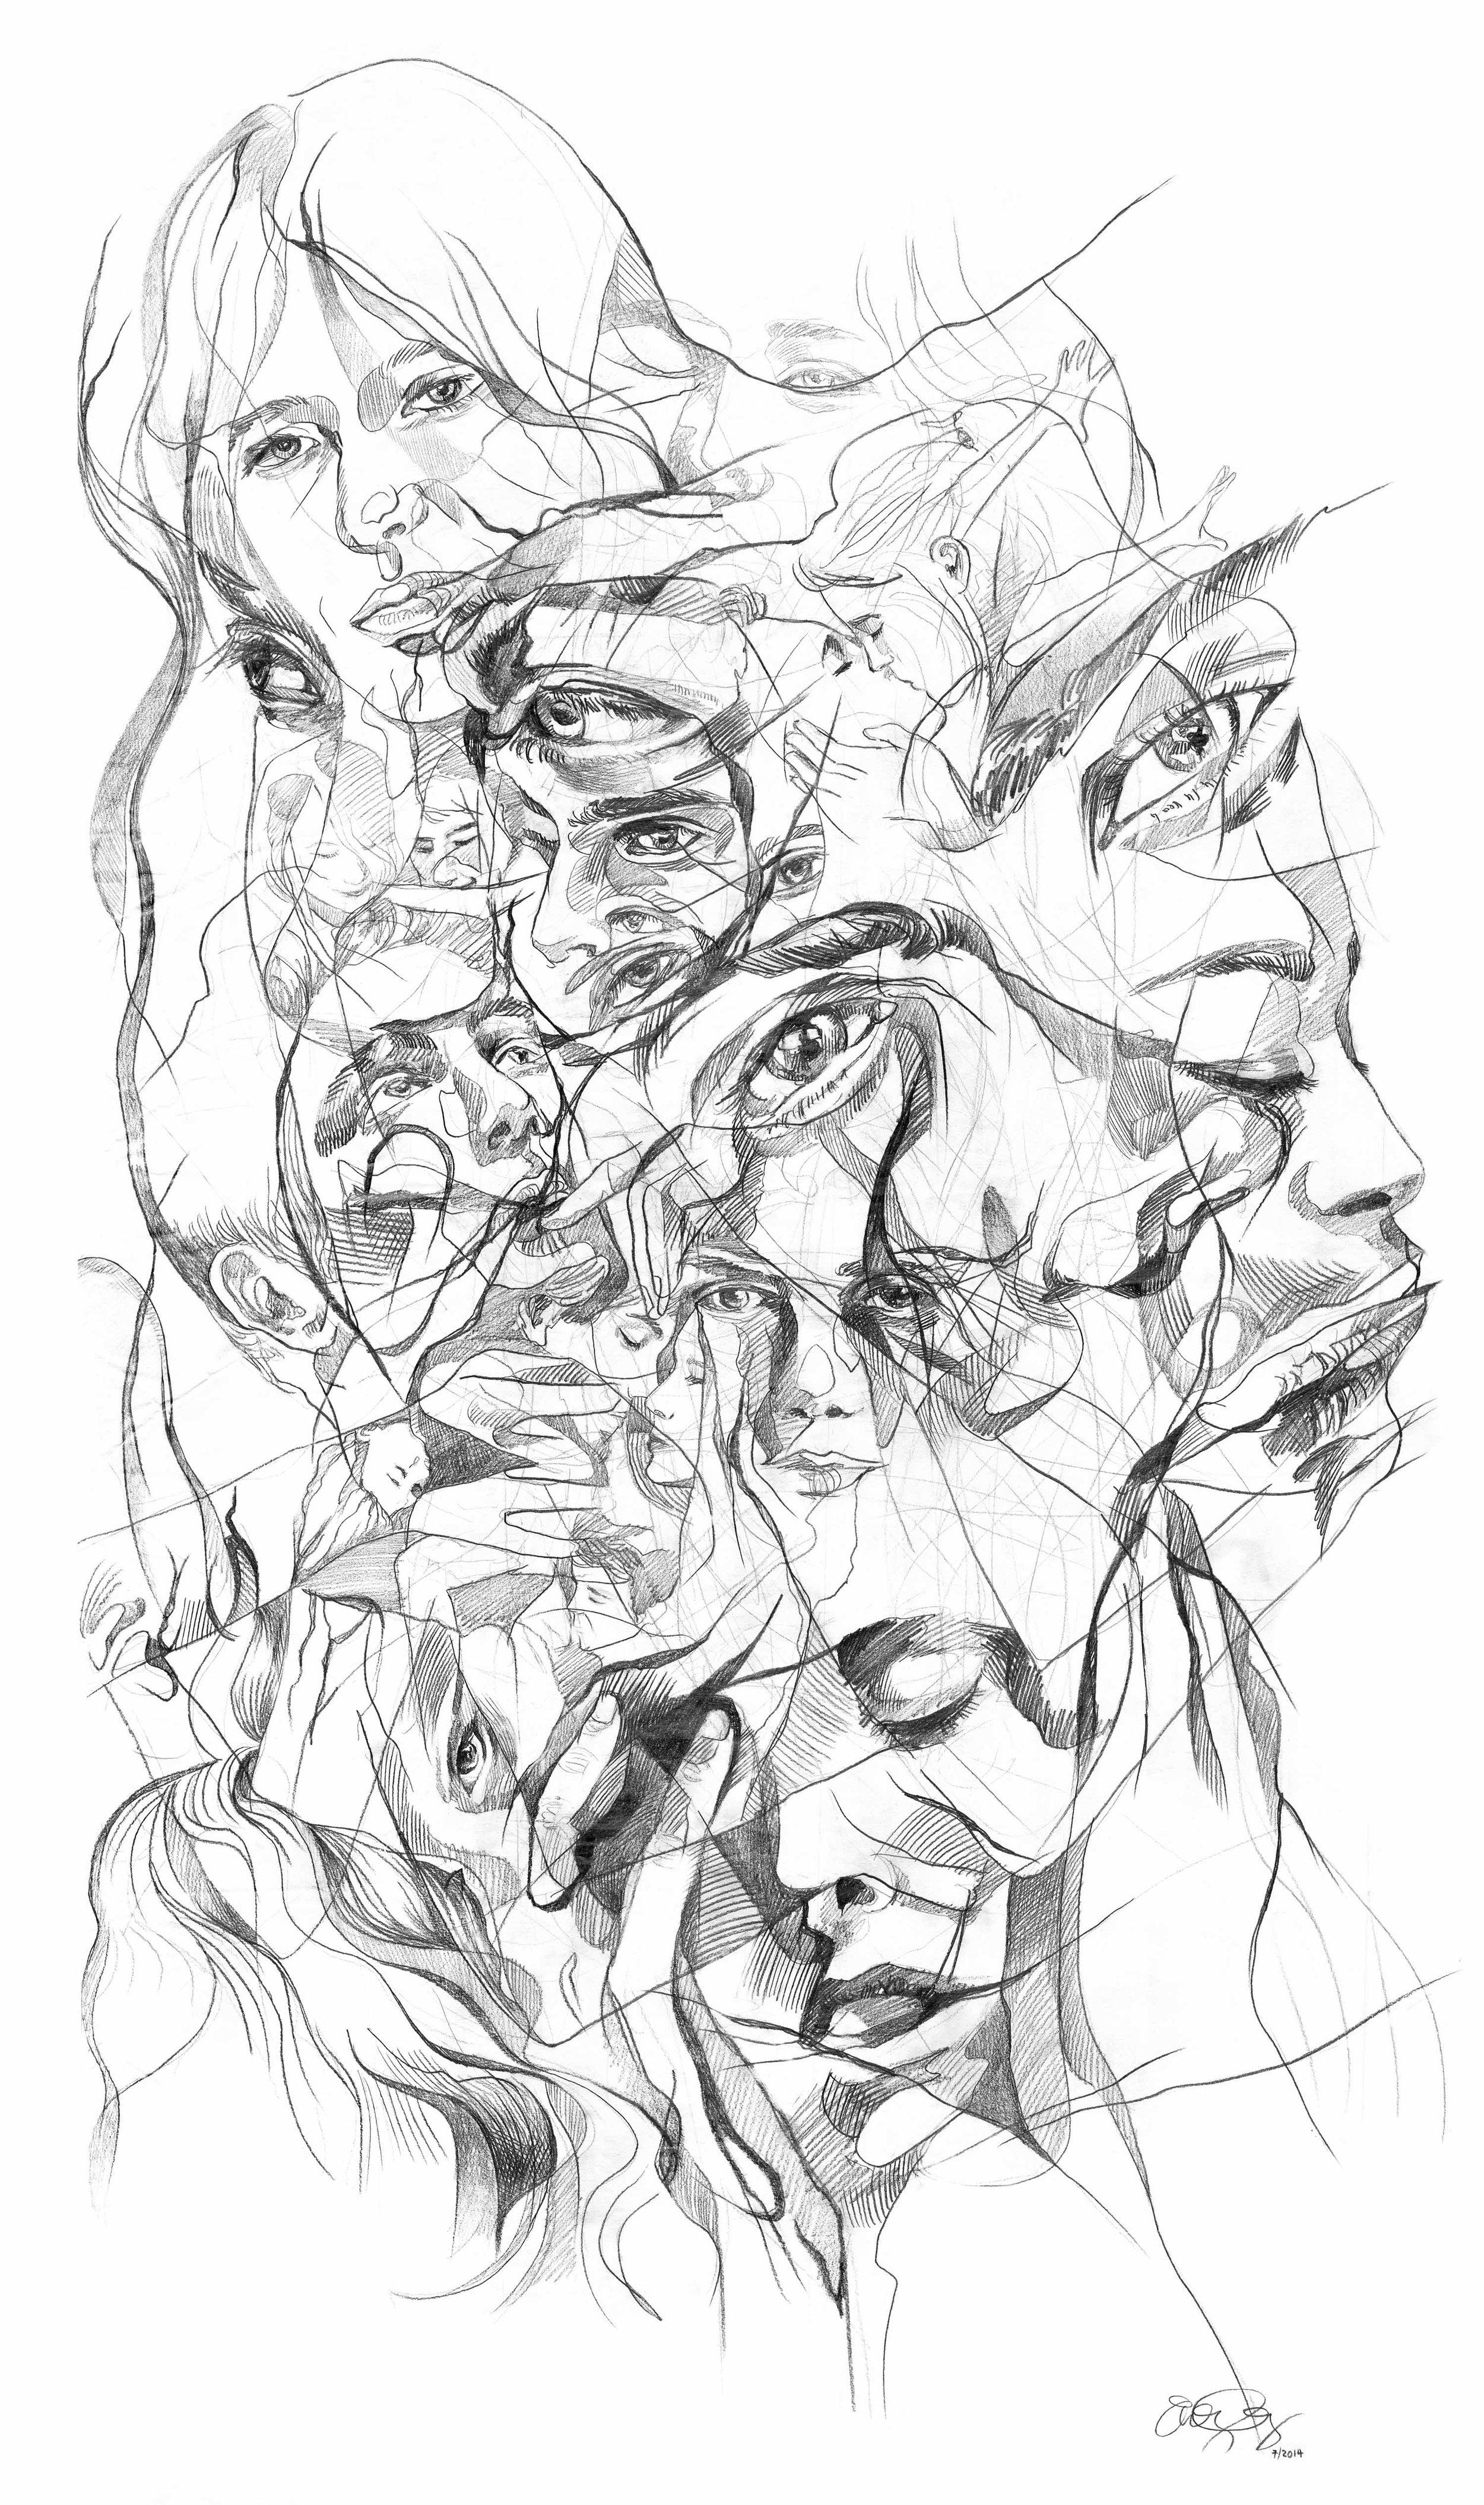 graphite-scanned-art-04-web-3quality-imageoptim.jpg